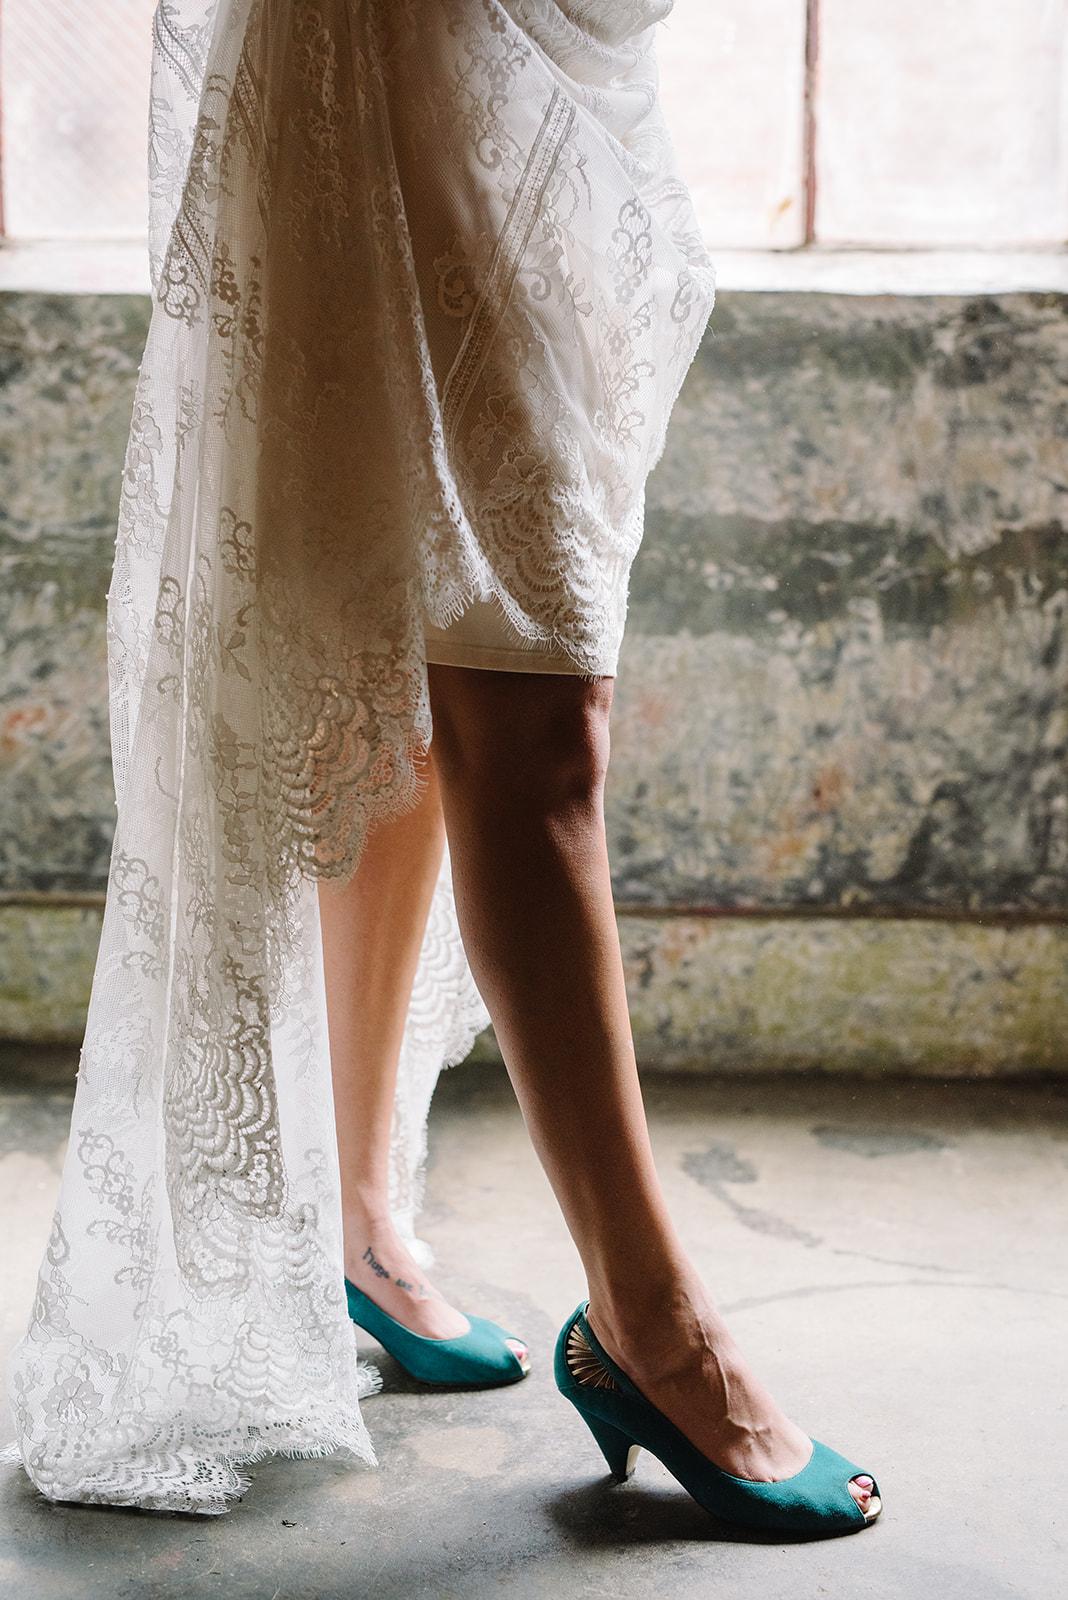 Art Factory Wedding- Industrial Chic- Audrey+Ryan- Paterson NJ- Olivia Christina Photo (23).jpg